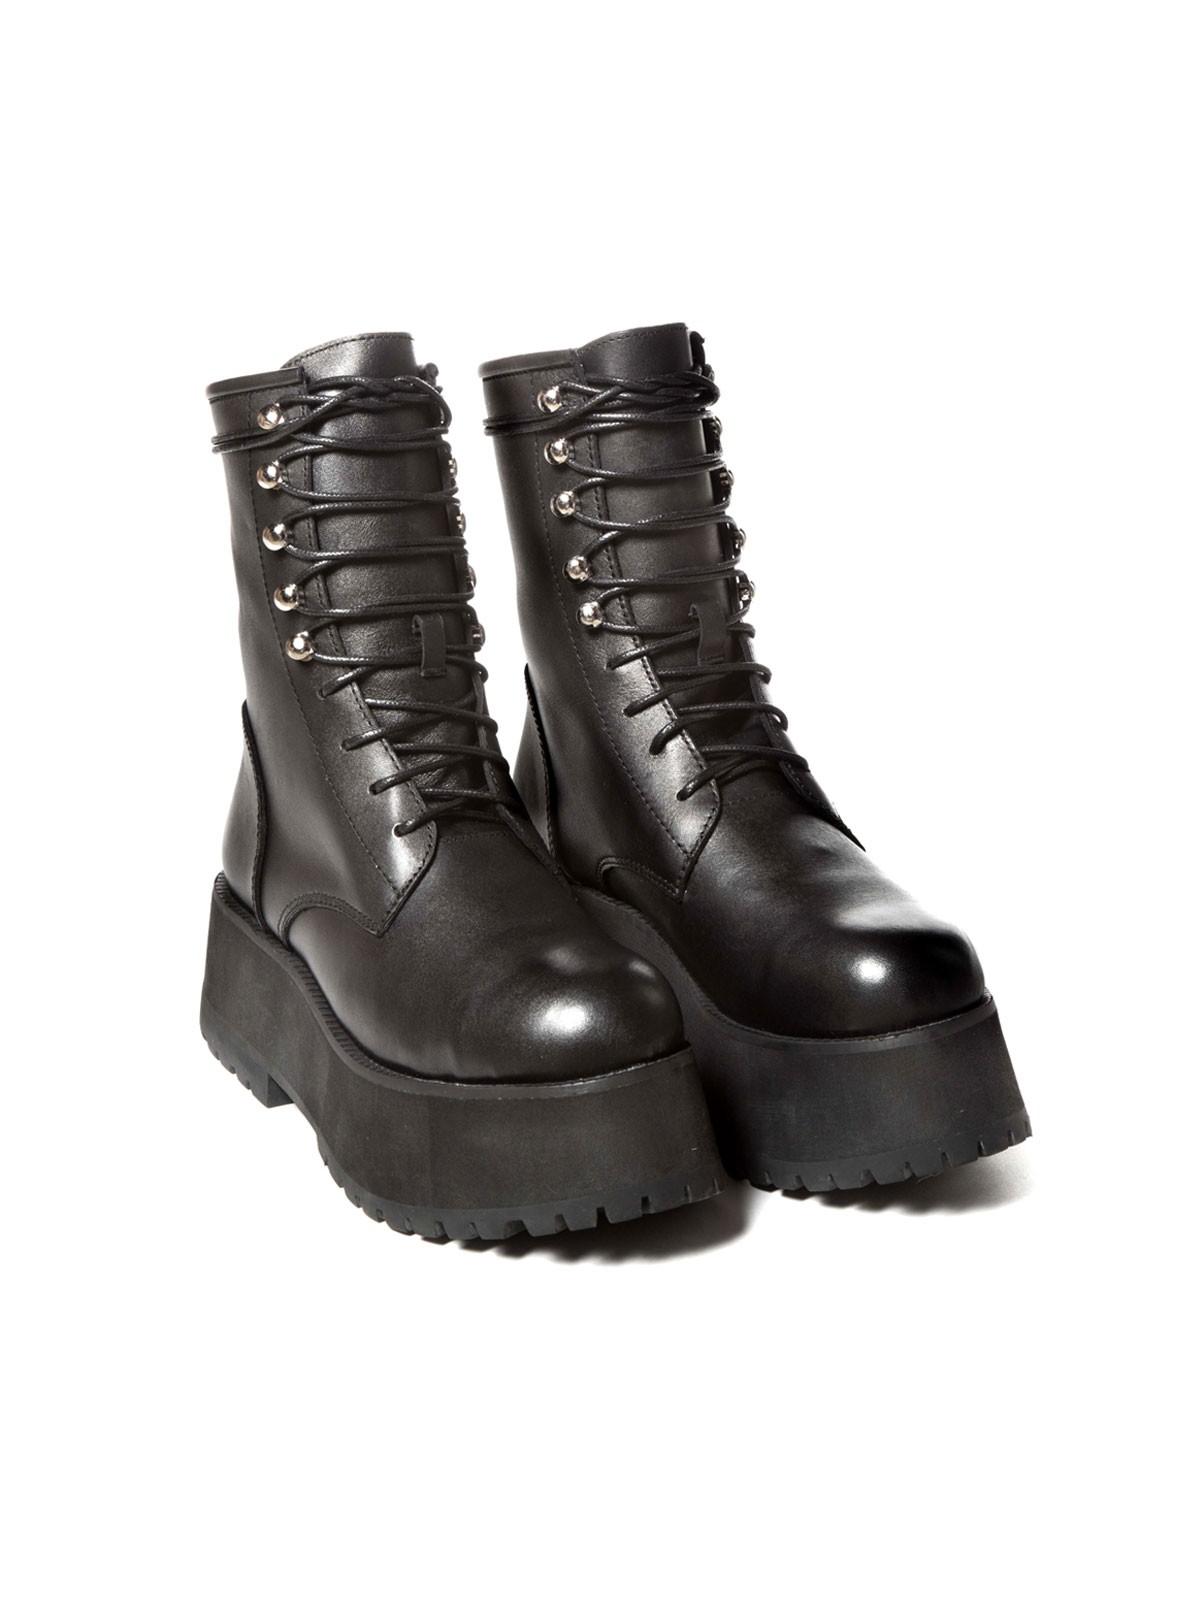 Armada boot